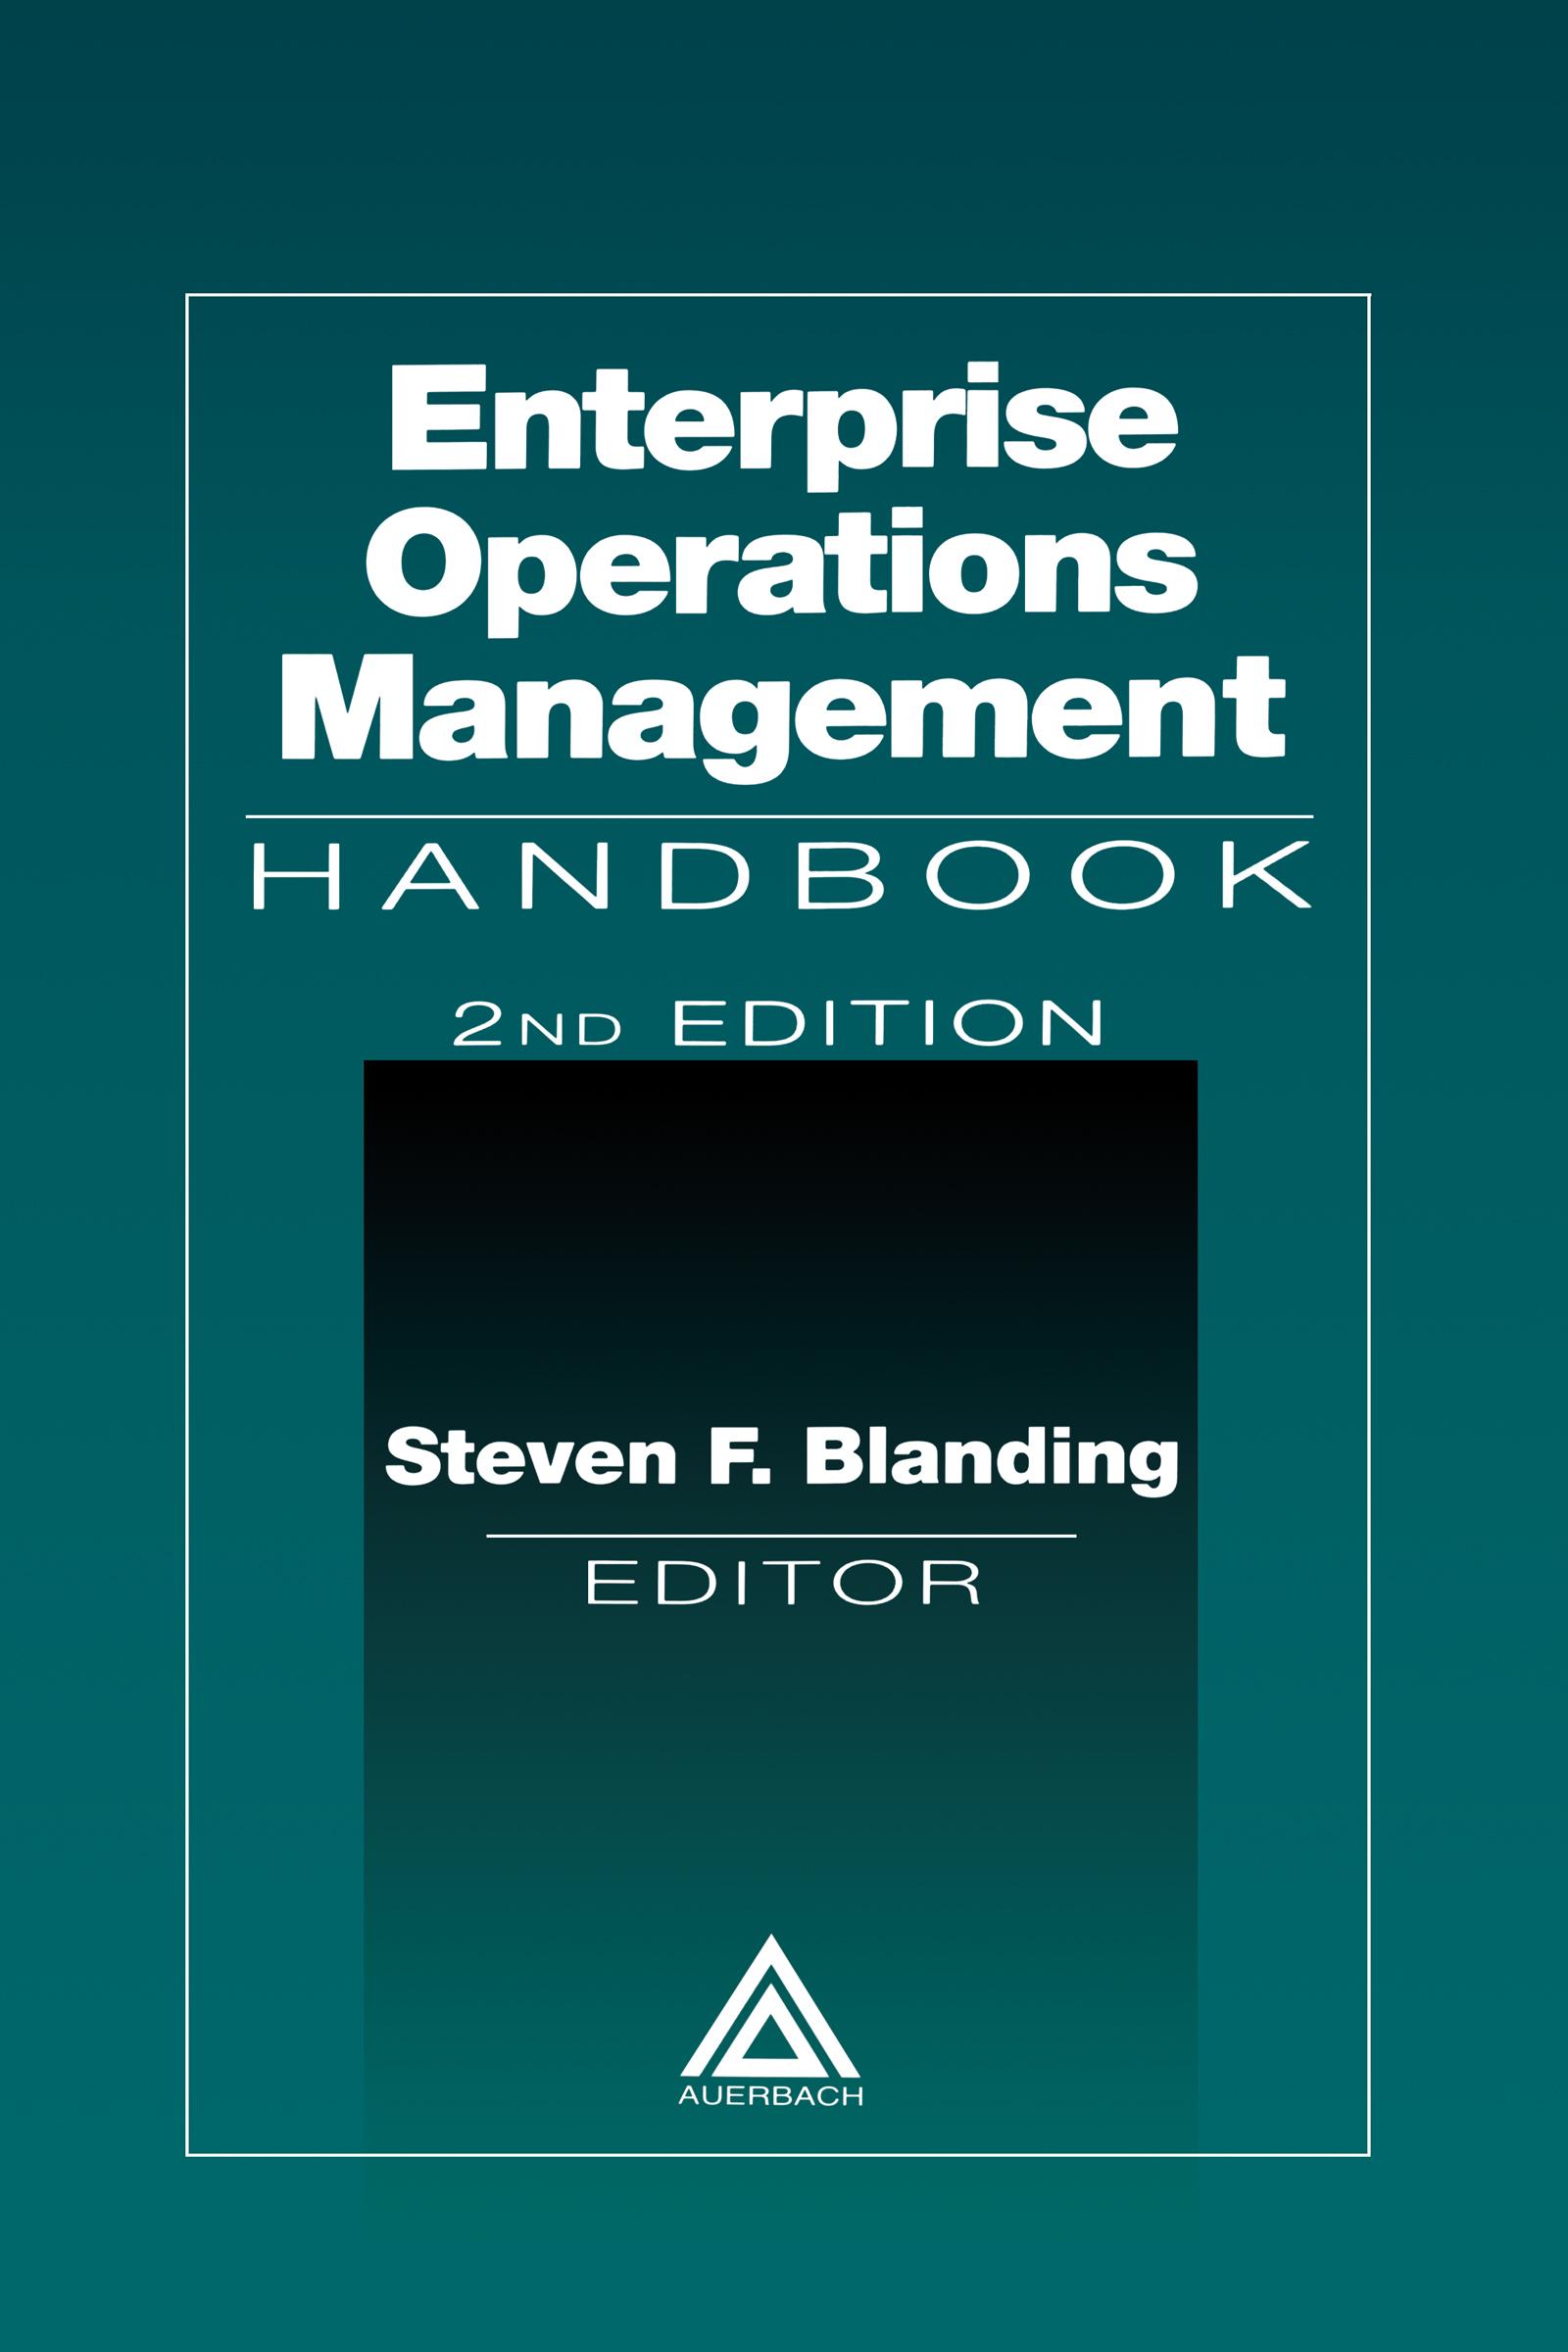 Enterprise Operations Management Handbook, Second Edition: 2nd Edition (Hardback) book cover